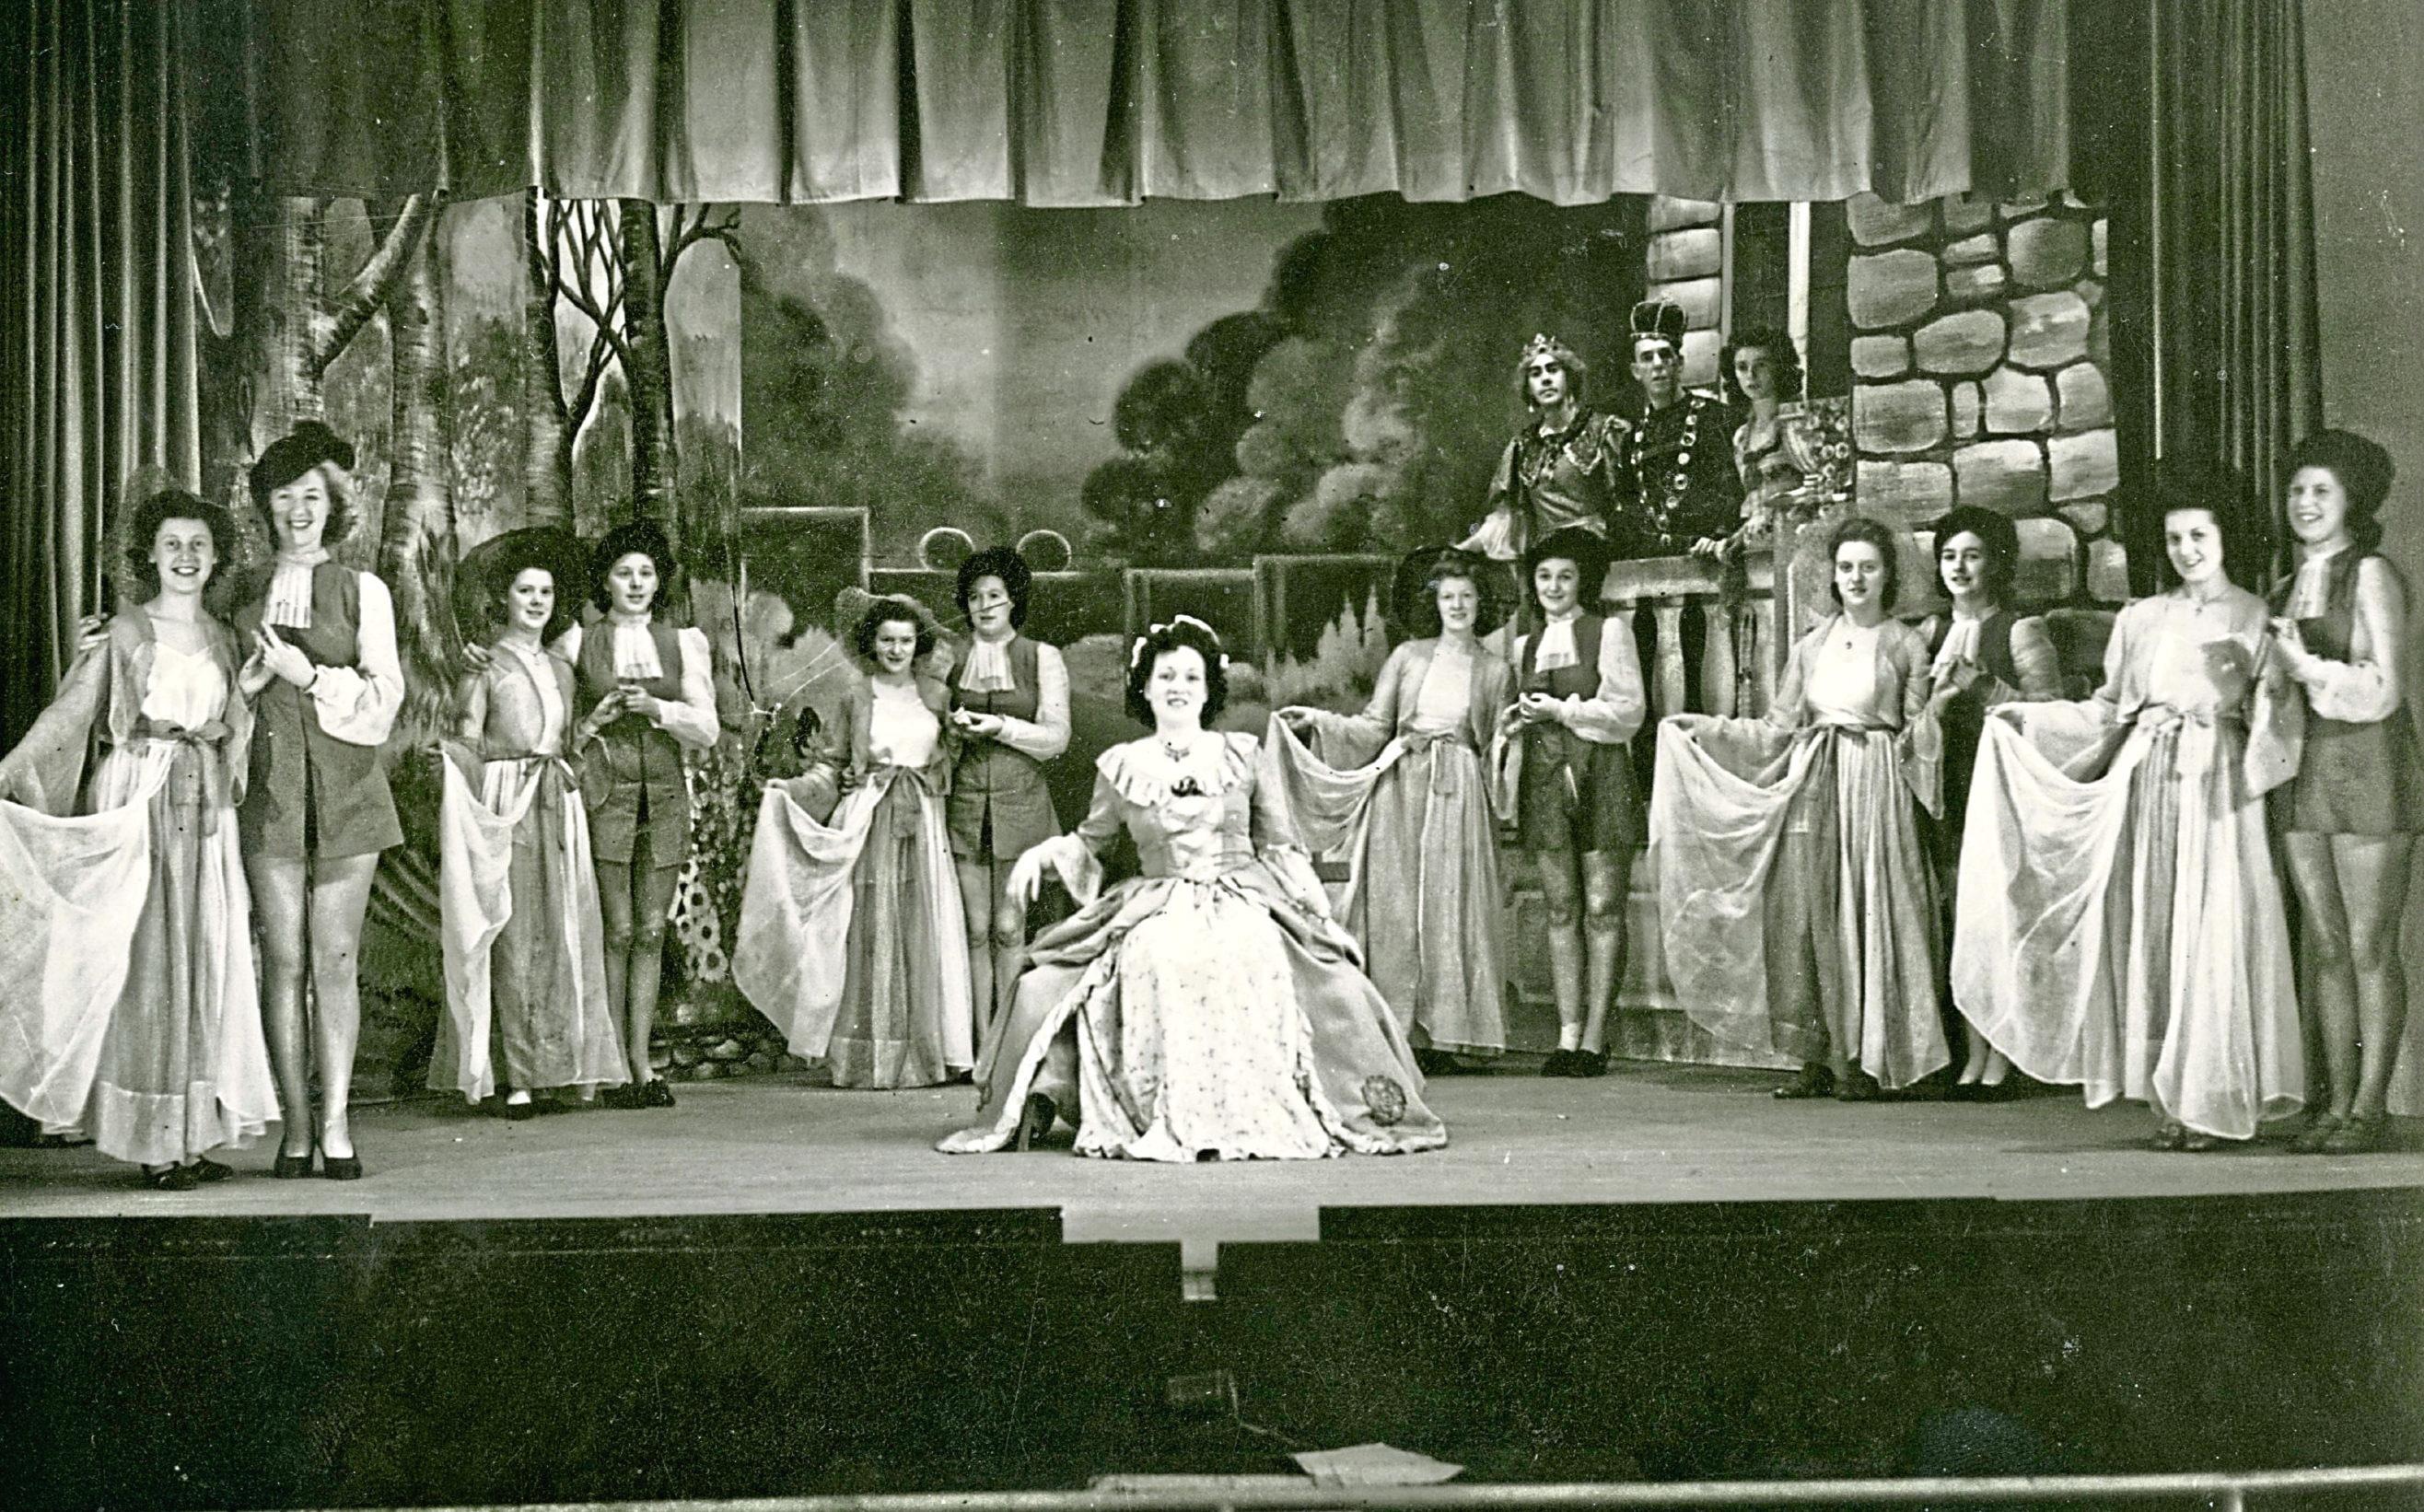 Garden party scene, Sleeping Beauty pantomime, Shrewsbury Theatre, 1944